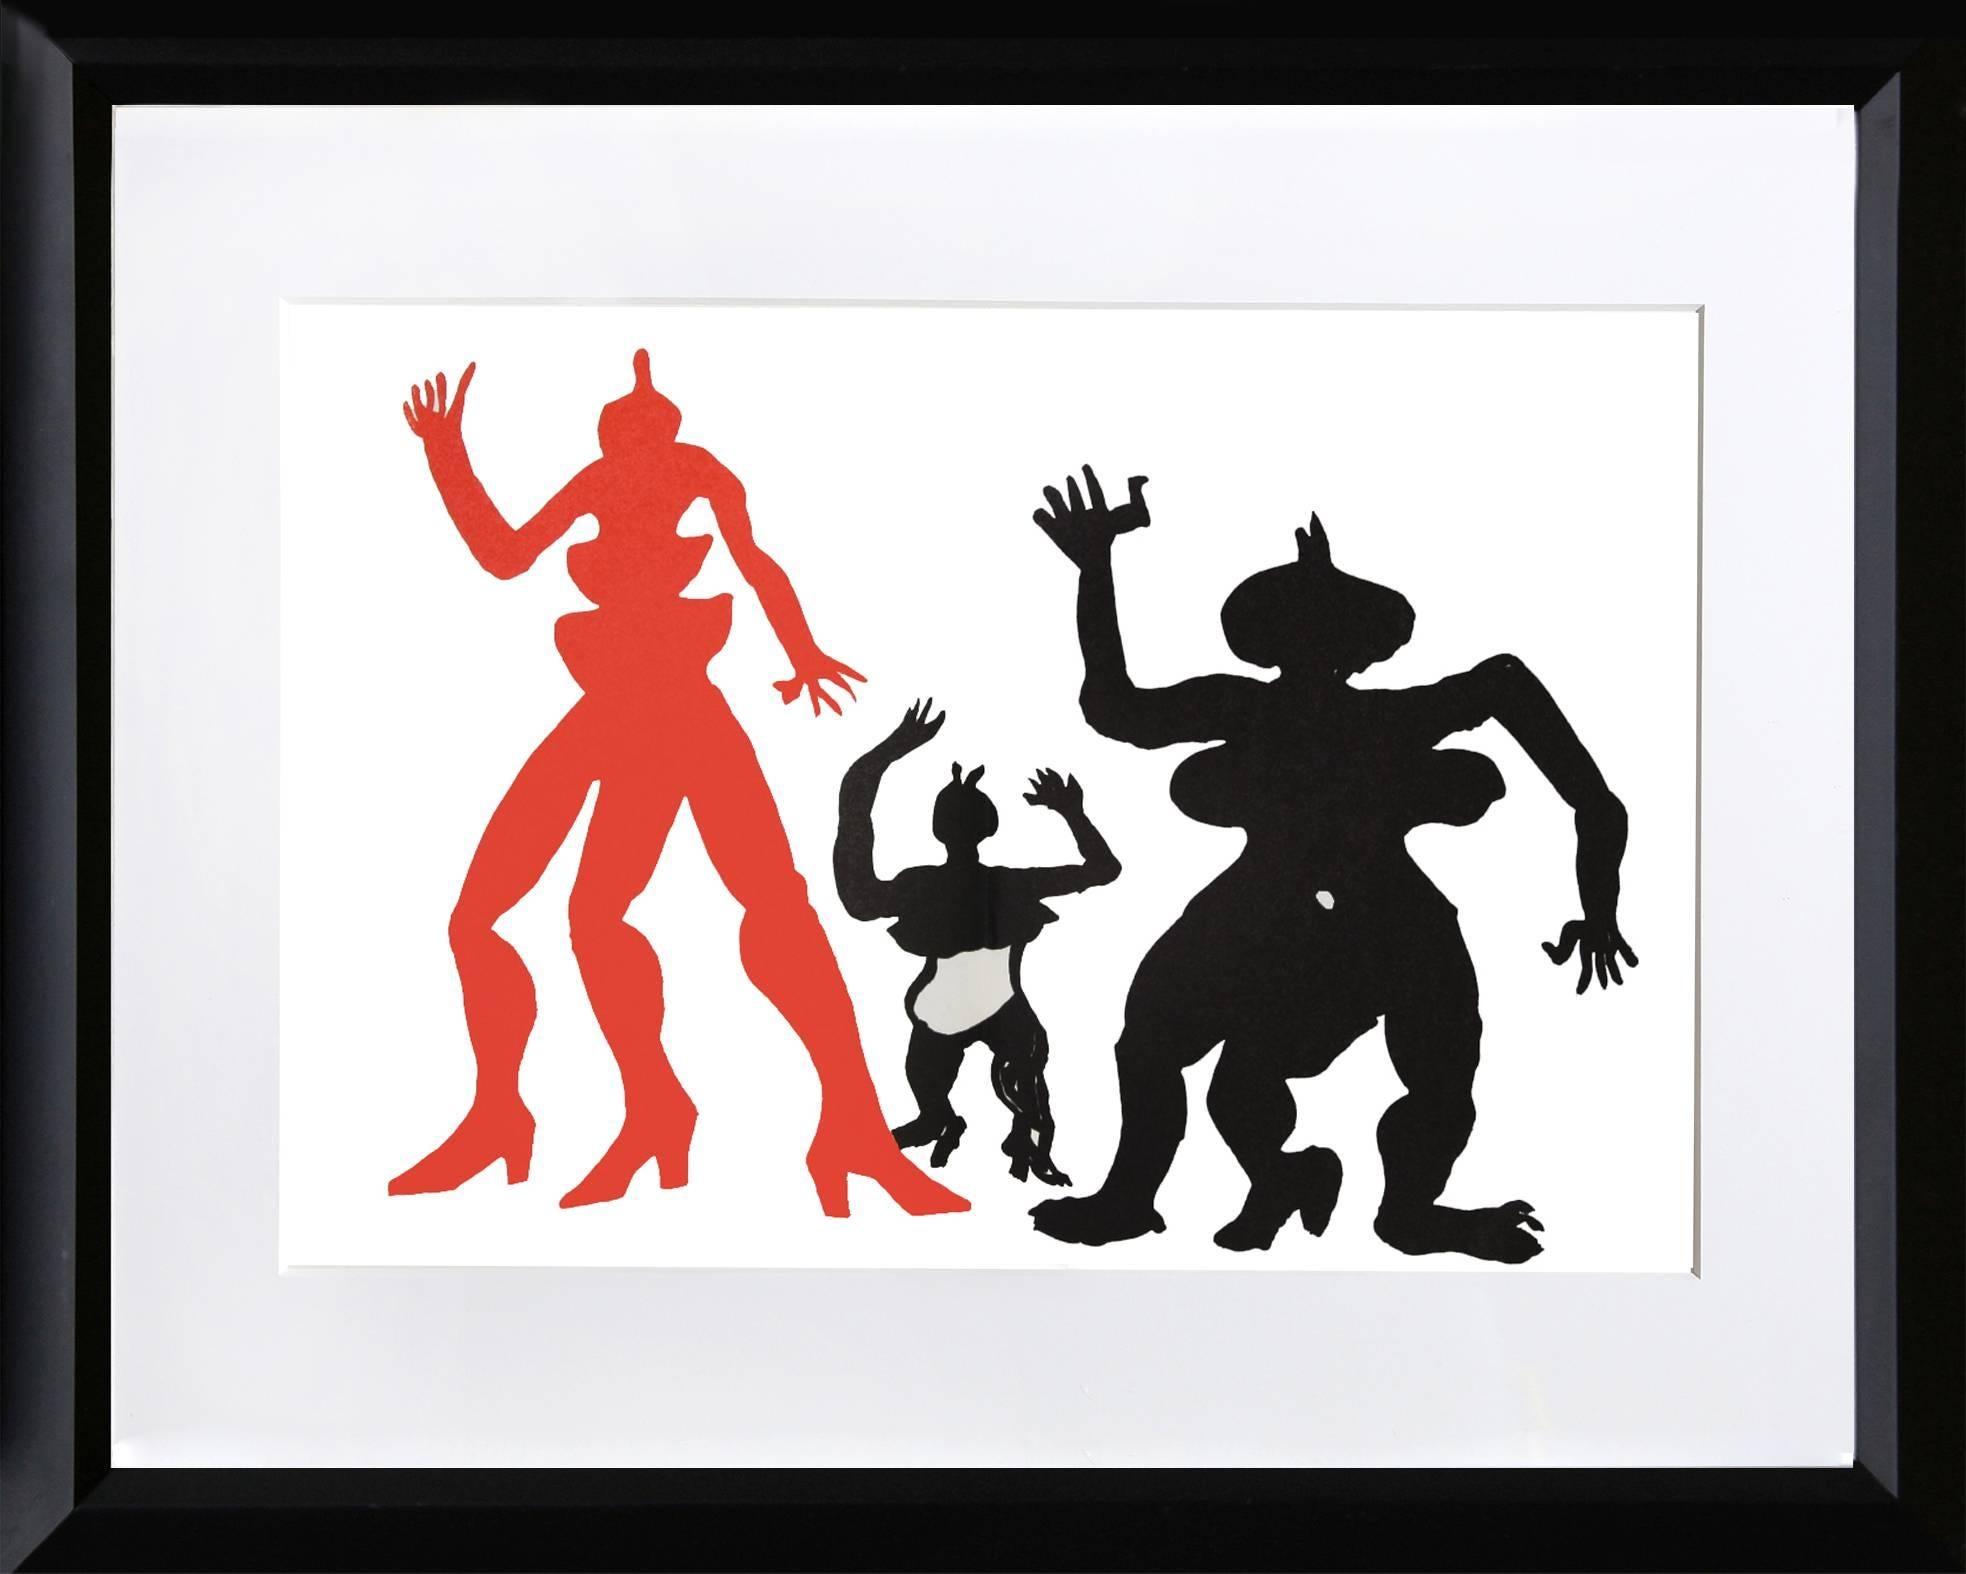 Three Acrobats, Lithograph by Alexander Calder